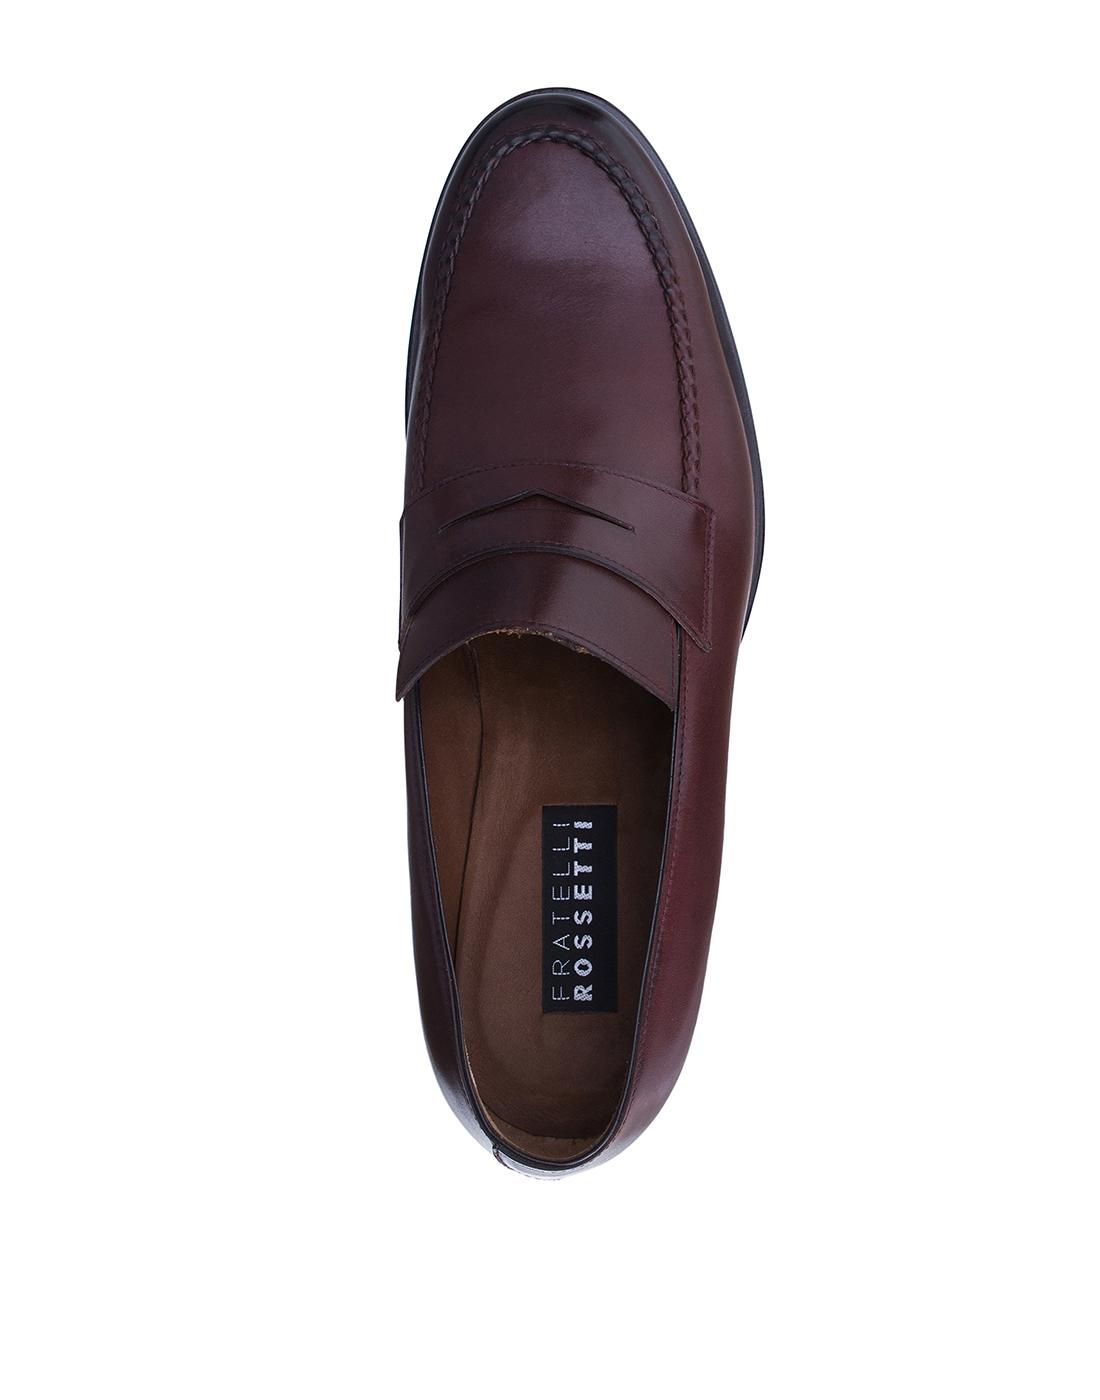 Туфли коричневые мужские Fratelli Rossetti S12597-5